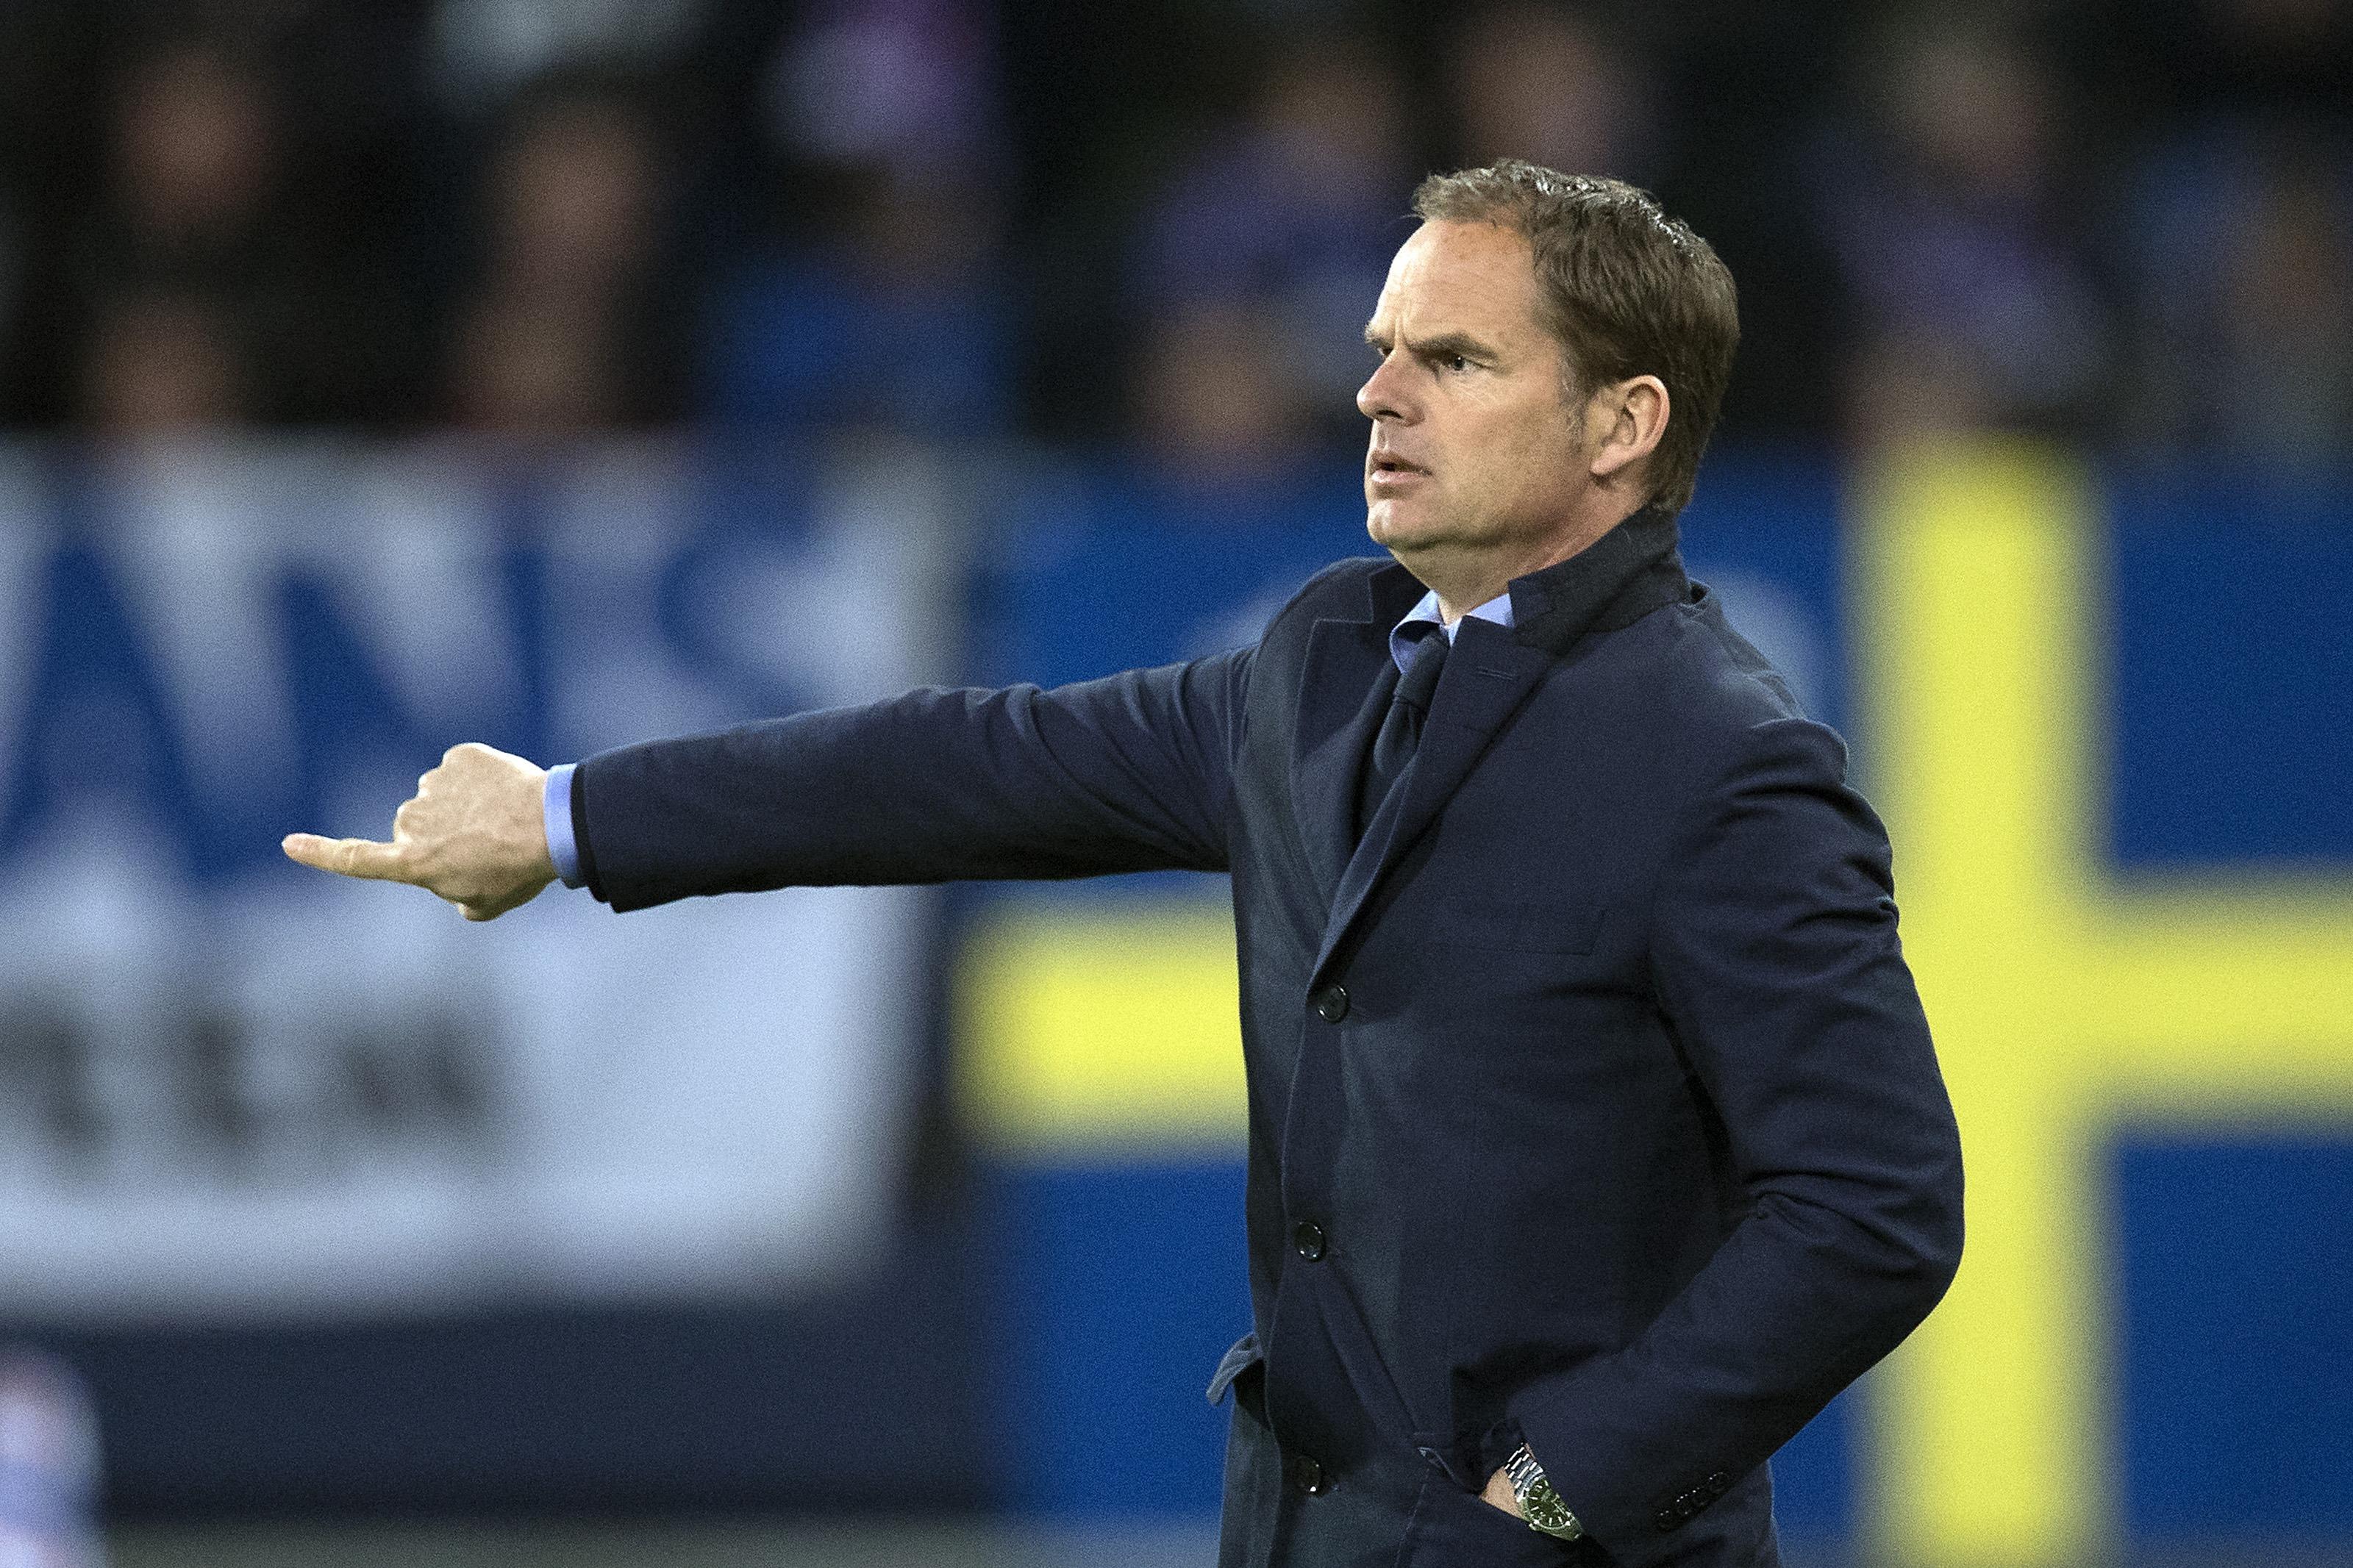 Everton already in talks to hire Frank de Boer as Roberto Martinez's replacement